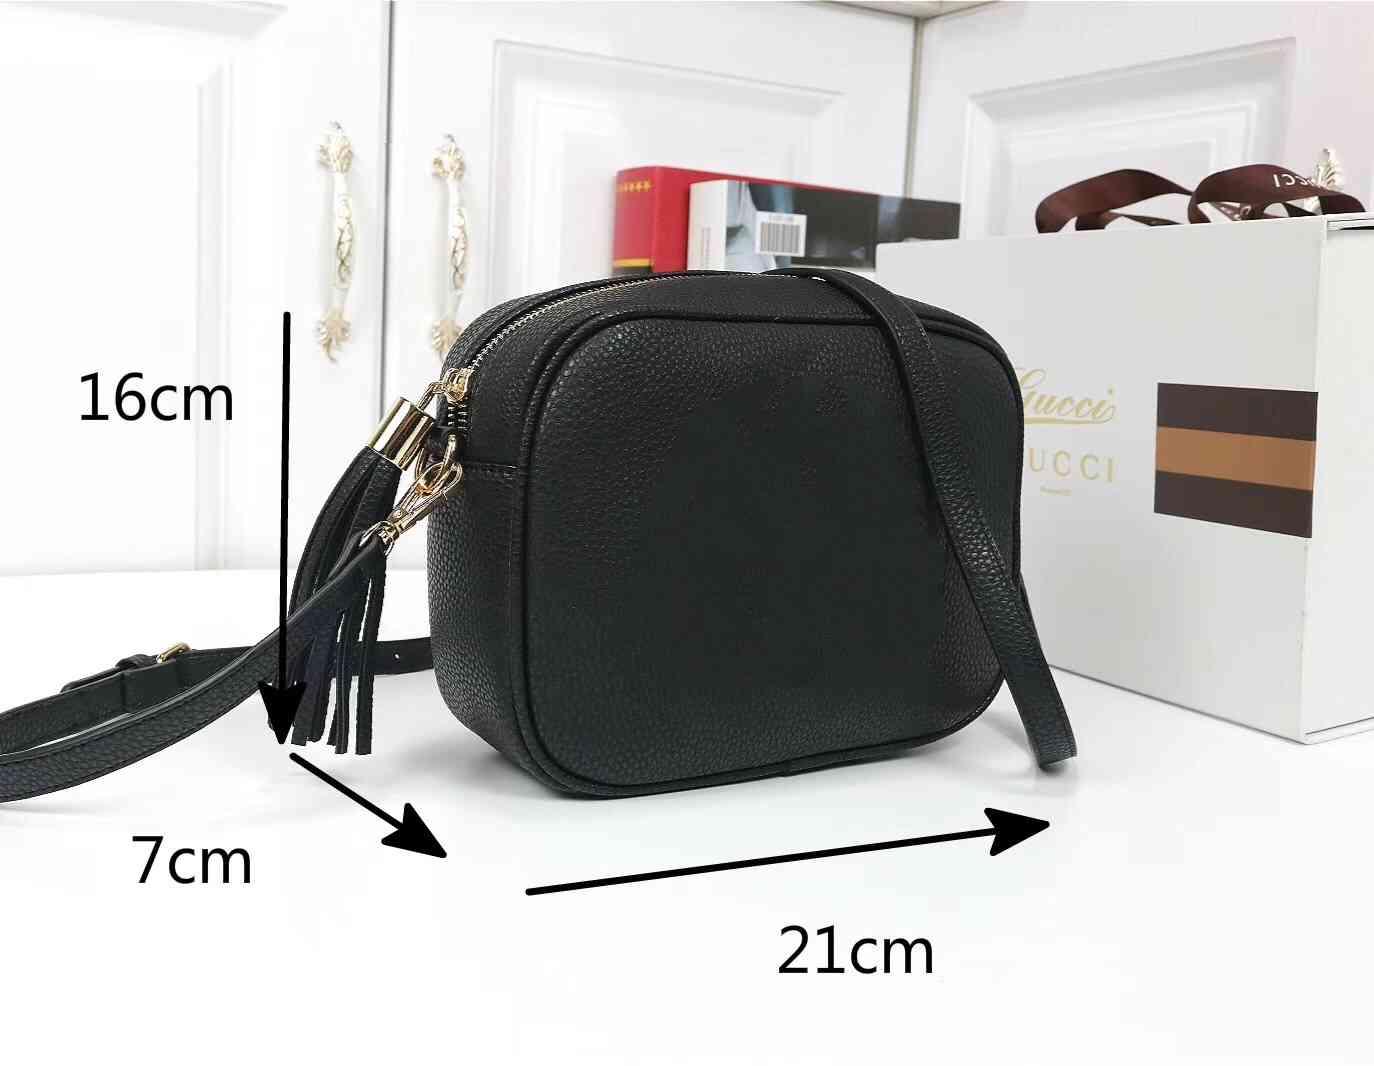 2021 Handbags high quality Luxury Wallet handbag women Crossbody bag Fashion Vintage leather Shoulder Tassel Bags